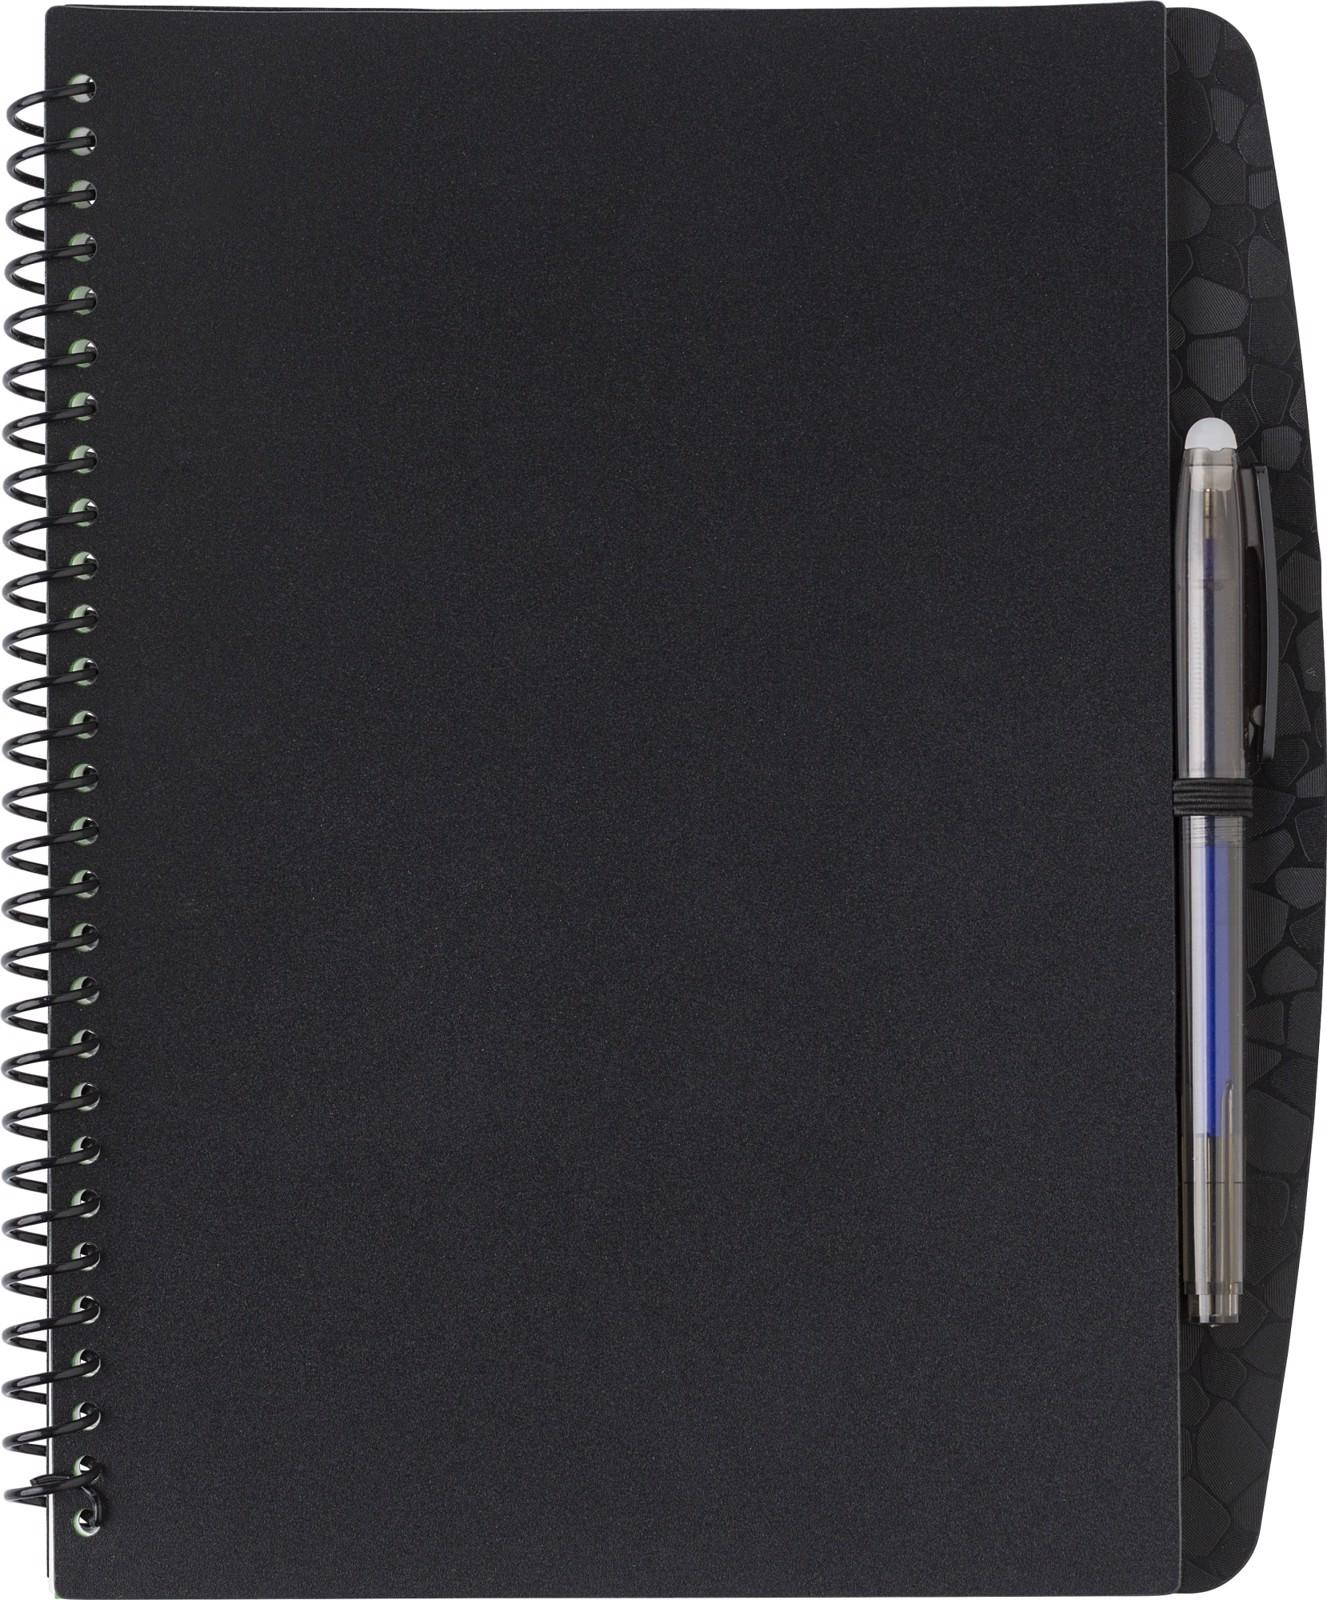 PP notebook - Black